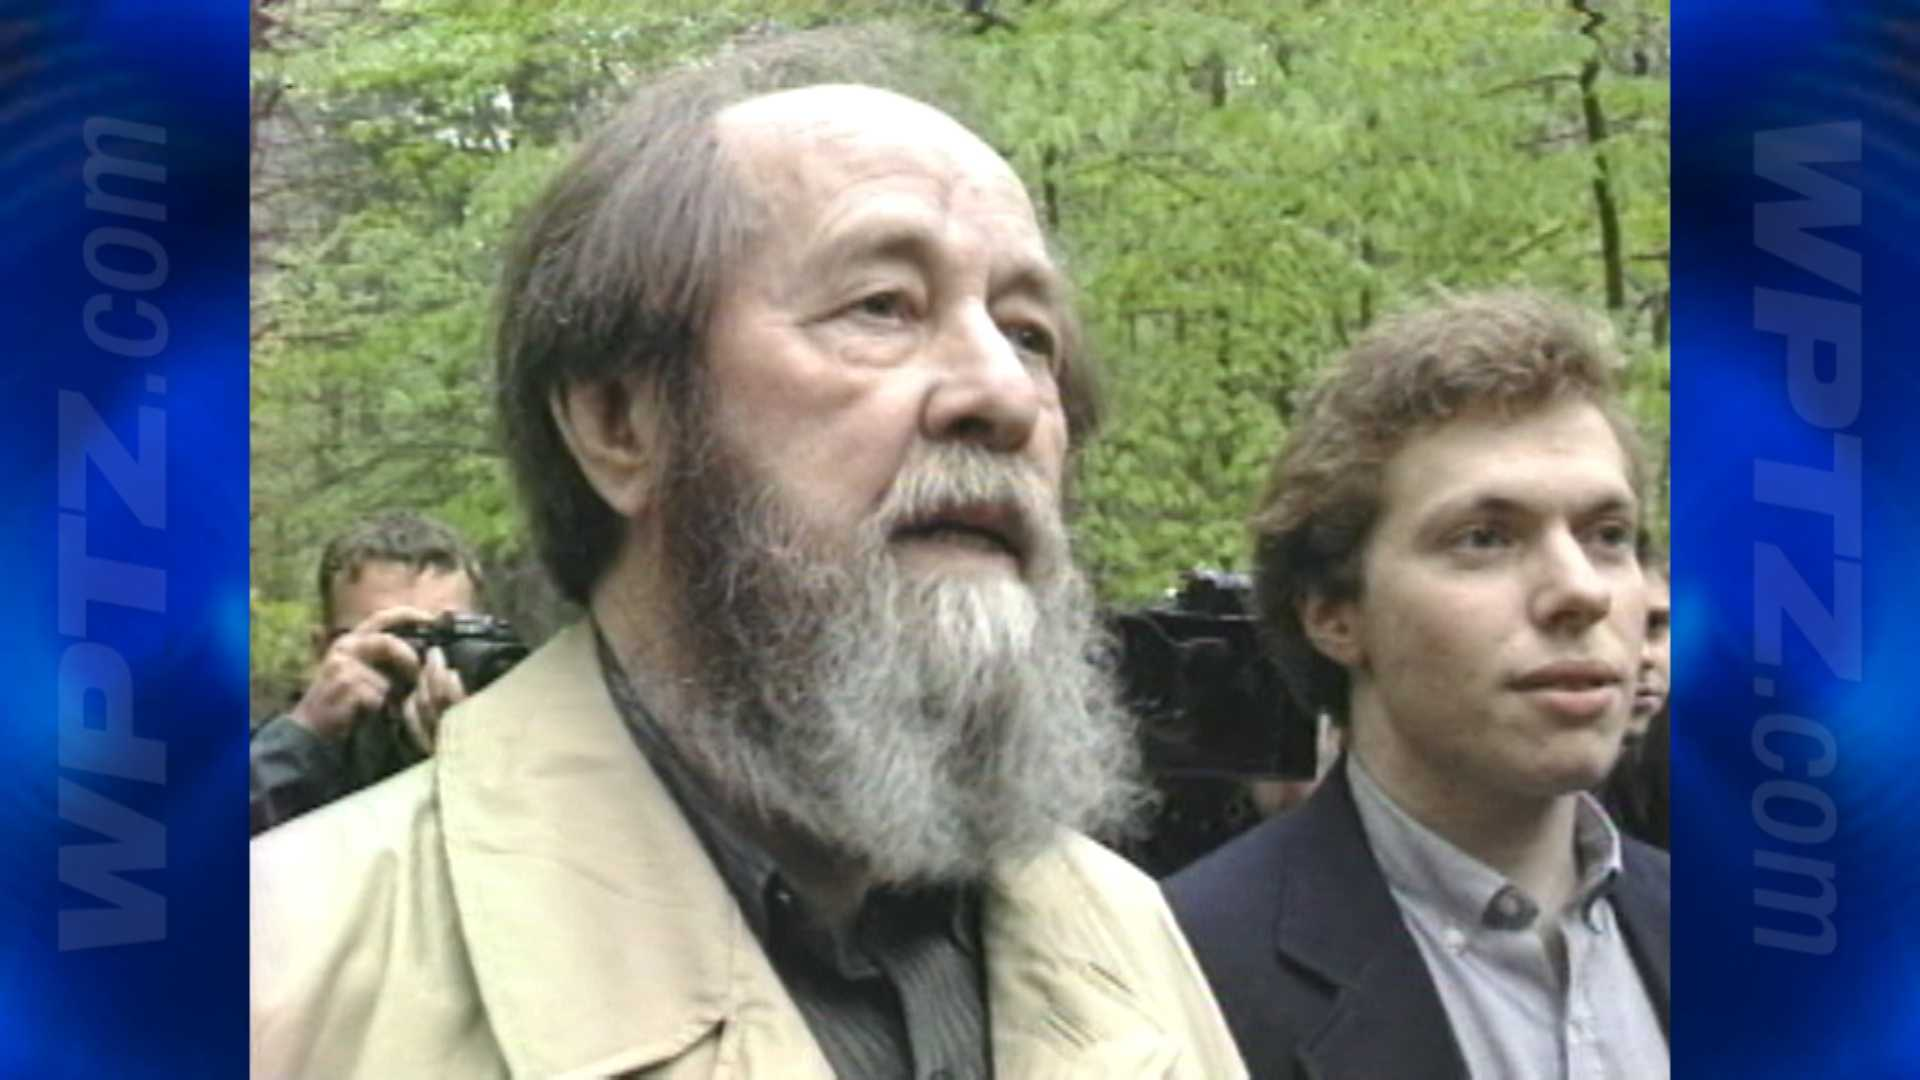 03-04-13 Vt. town OKs church takeover, Solzhenitsyn exhibit - img